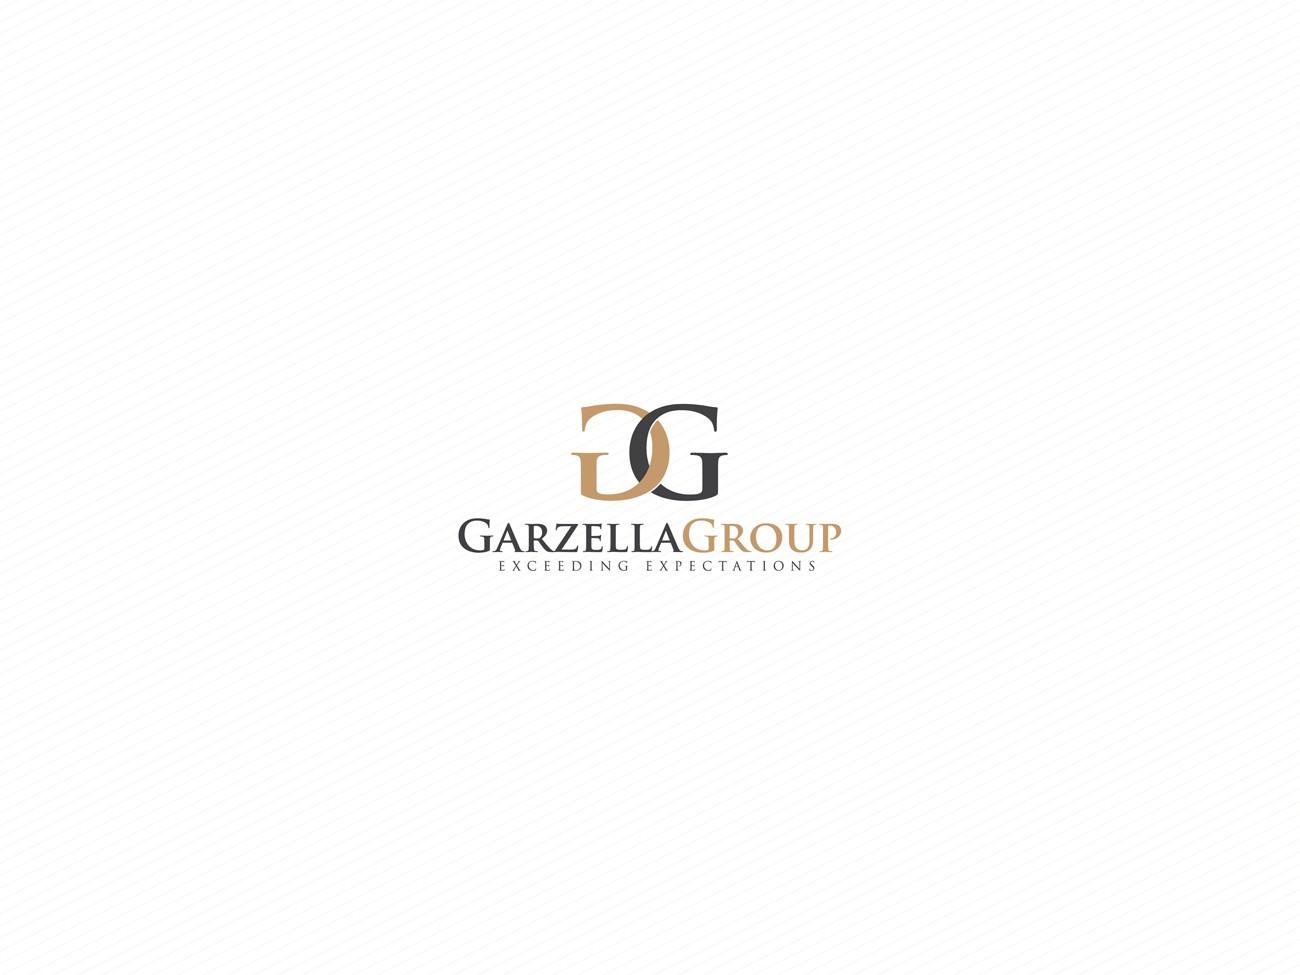 Help Garzella Group or The Garzella Group, Inc with a new logo